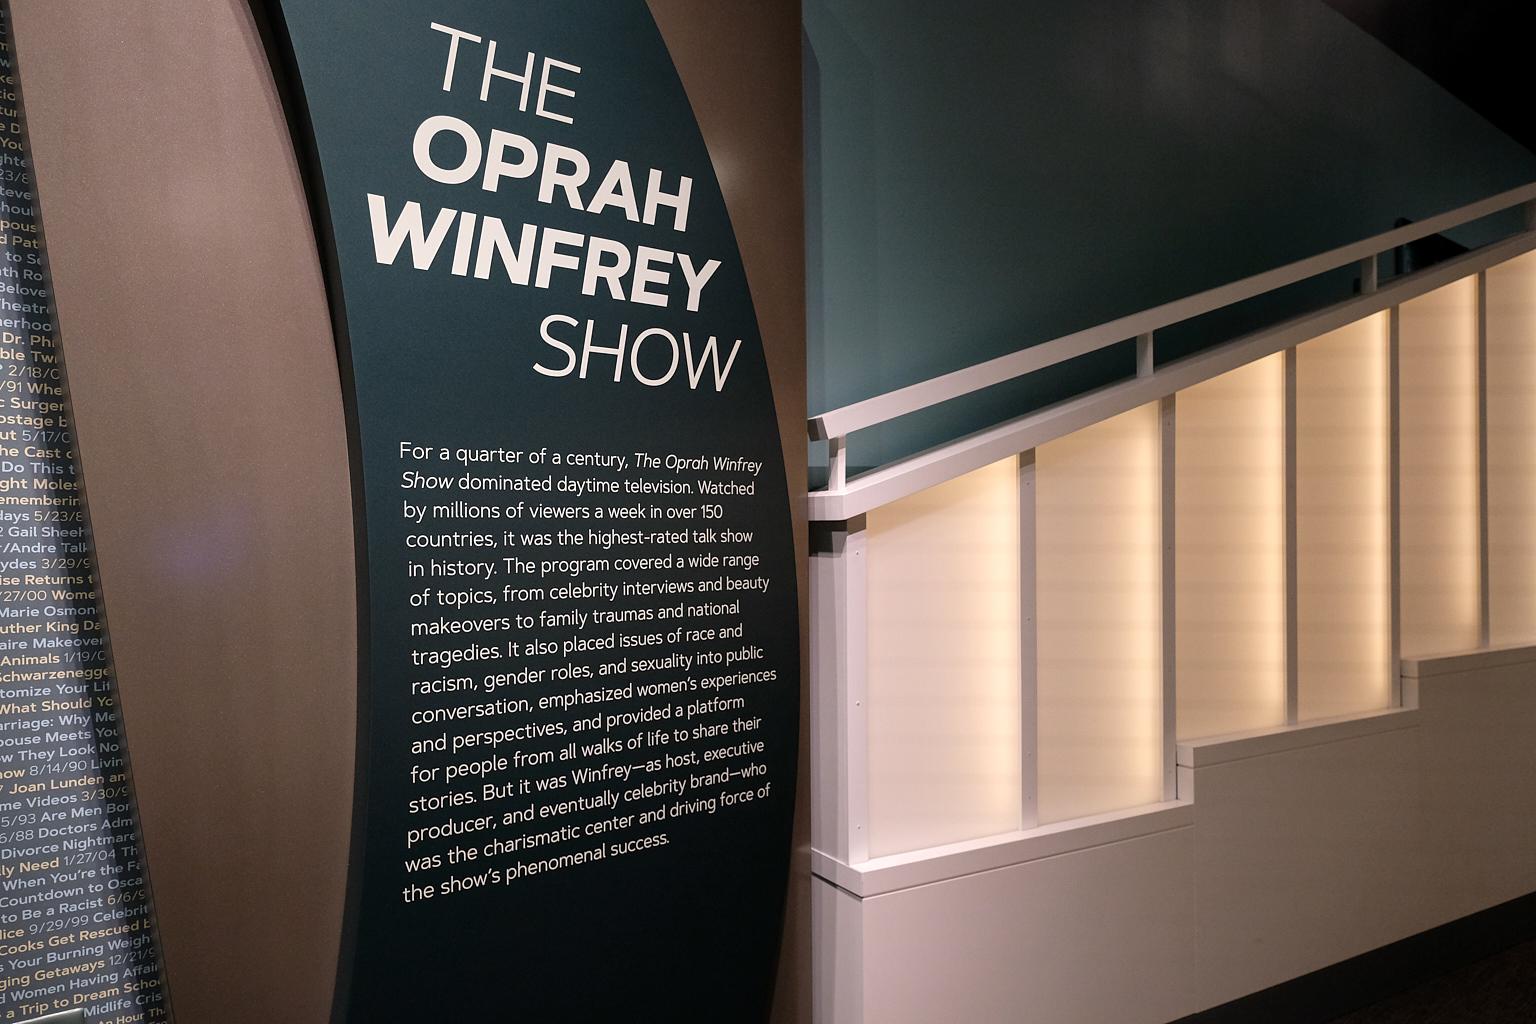 NMAAHC_Oprah_Exhibit_2018-09-26-086.jpg